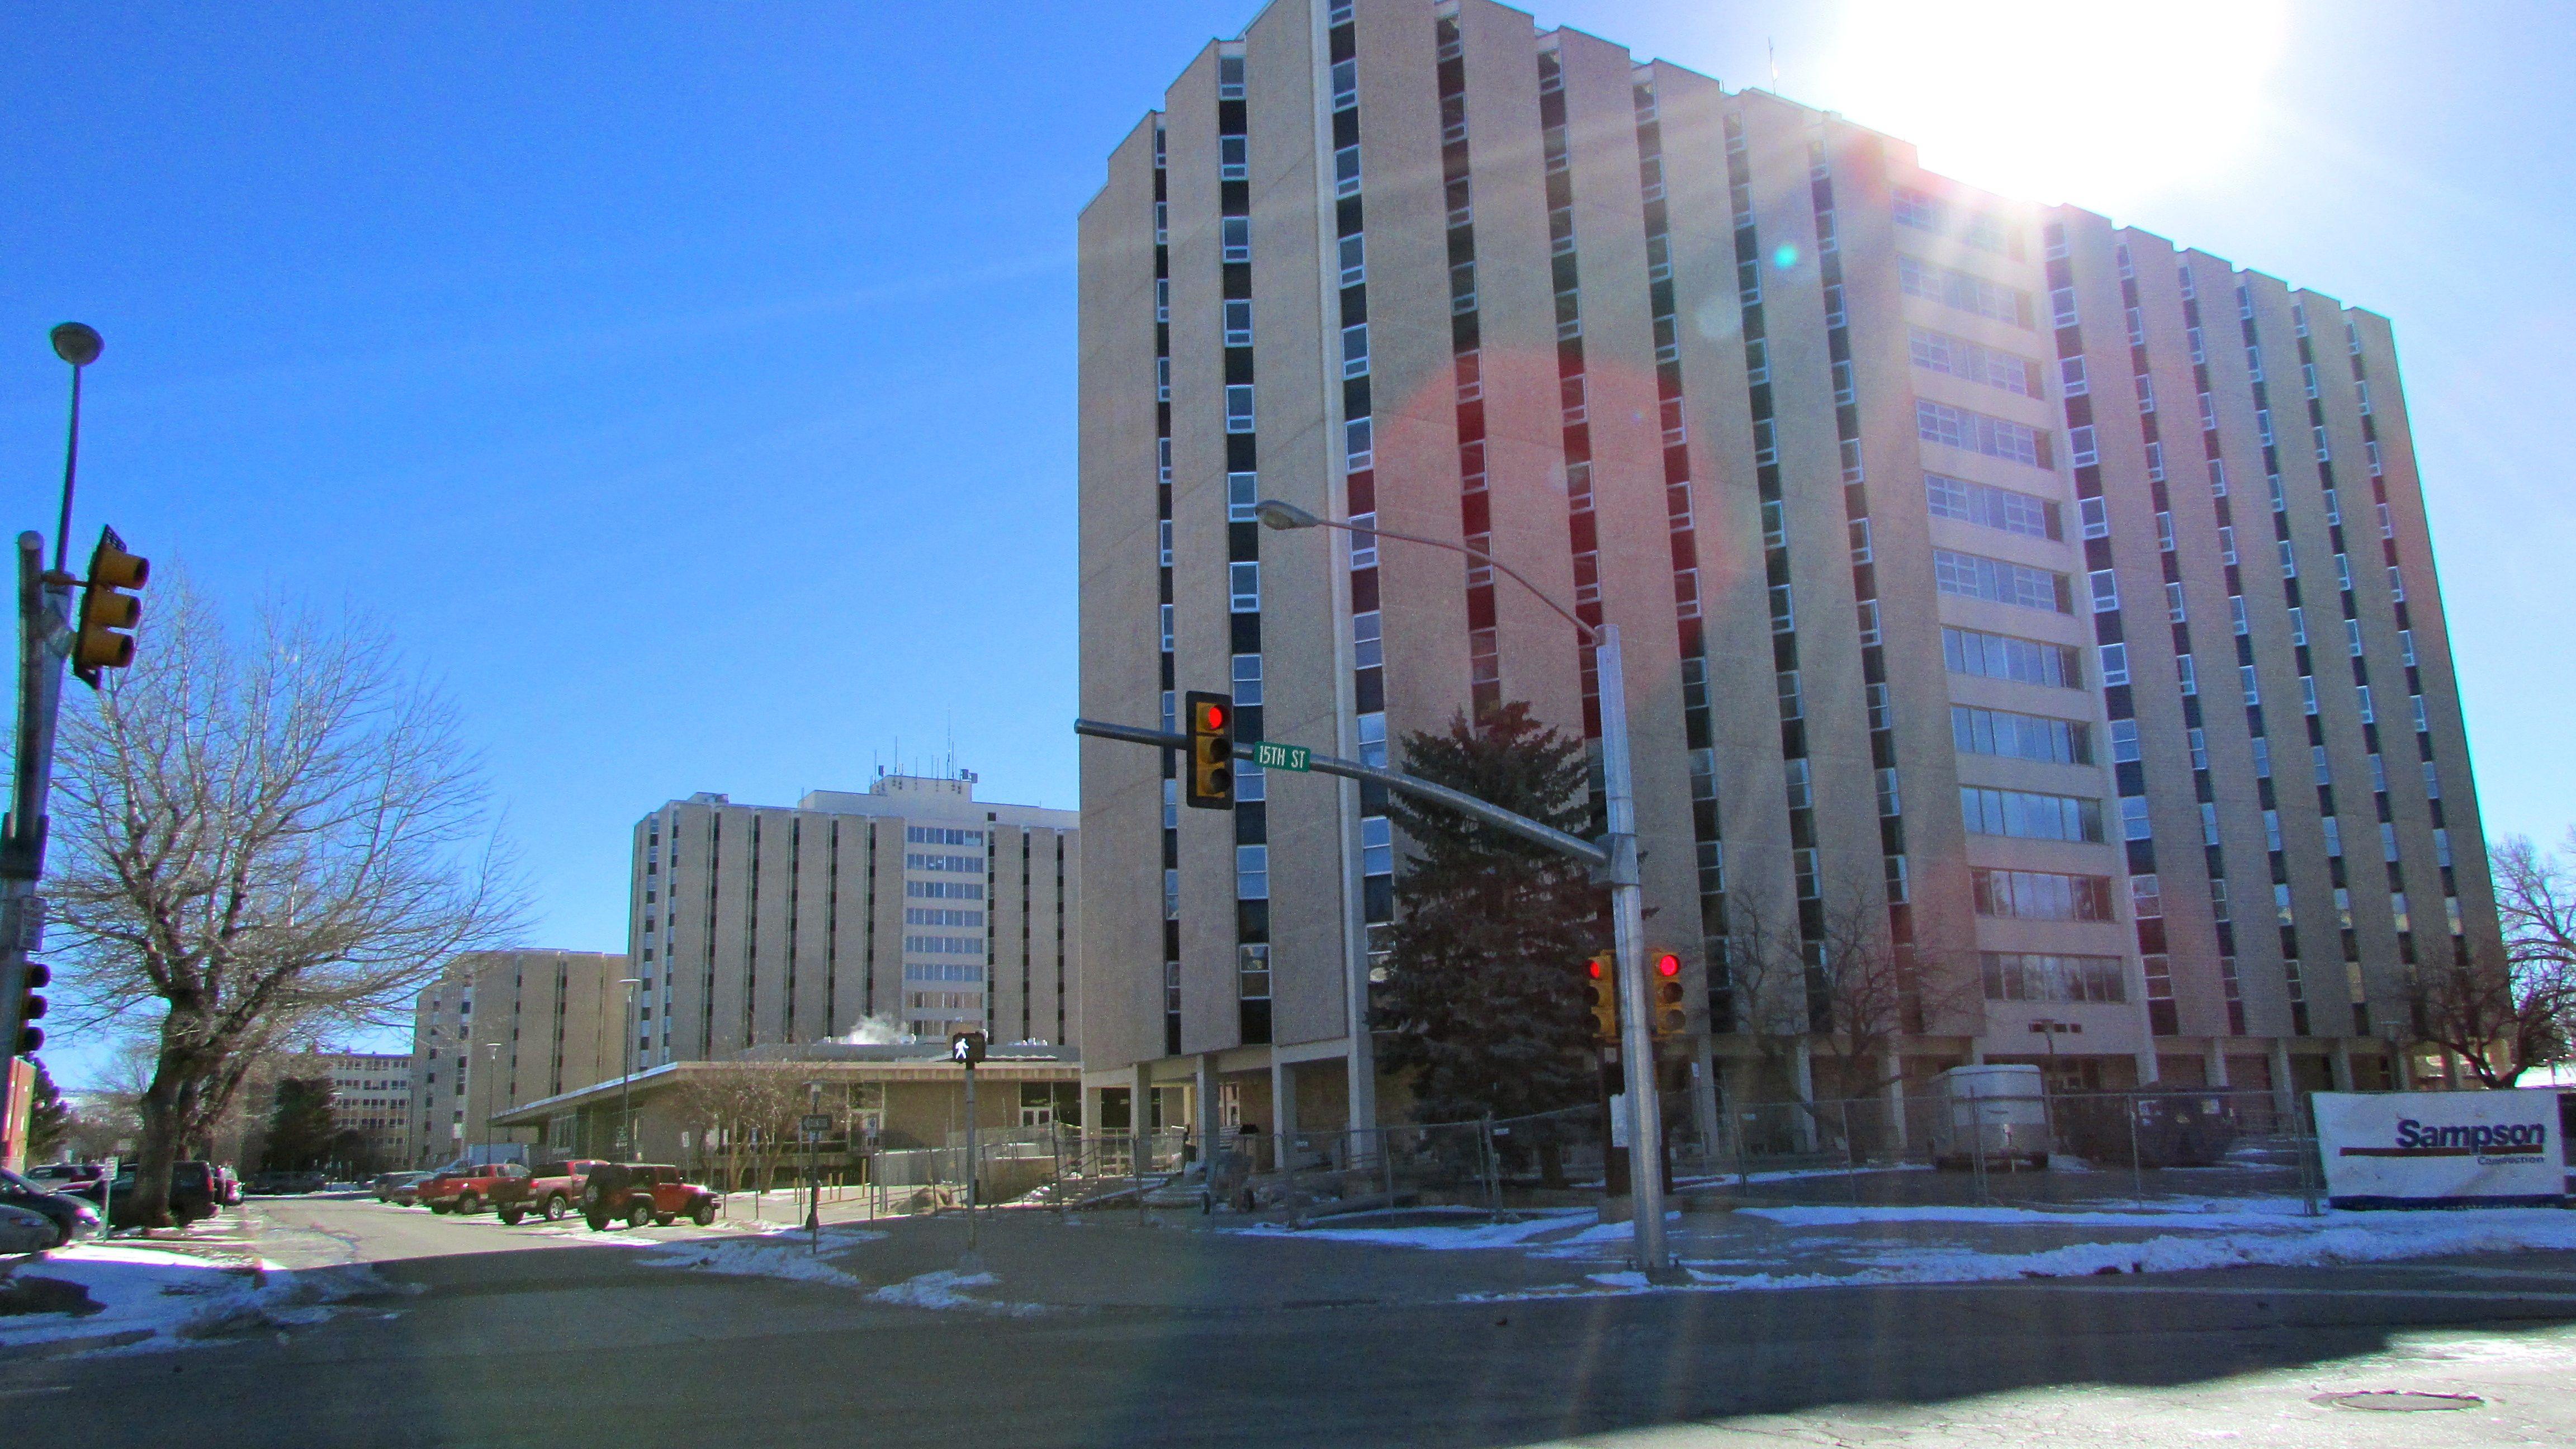 University of Wyoming residence halls.